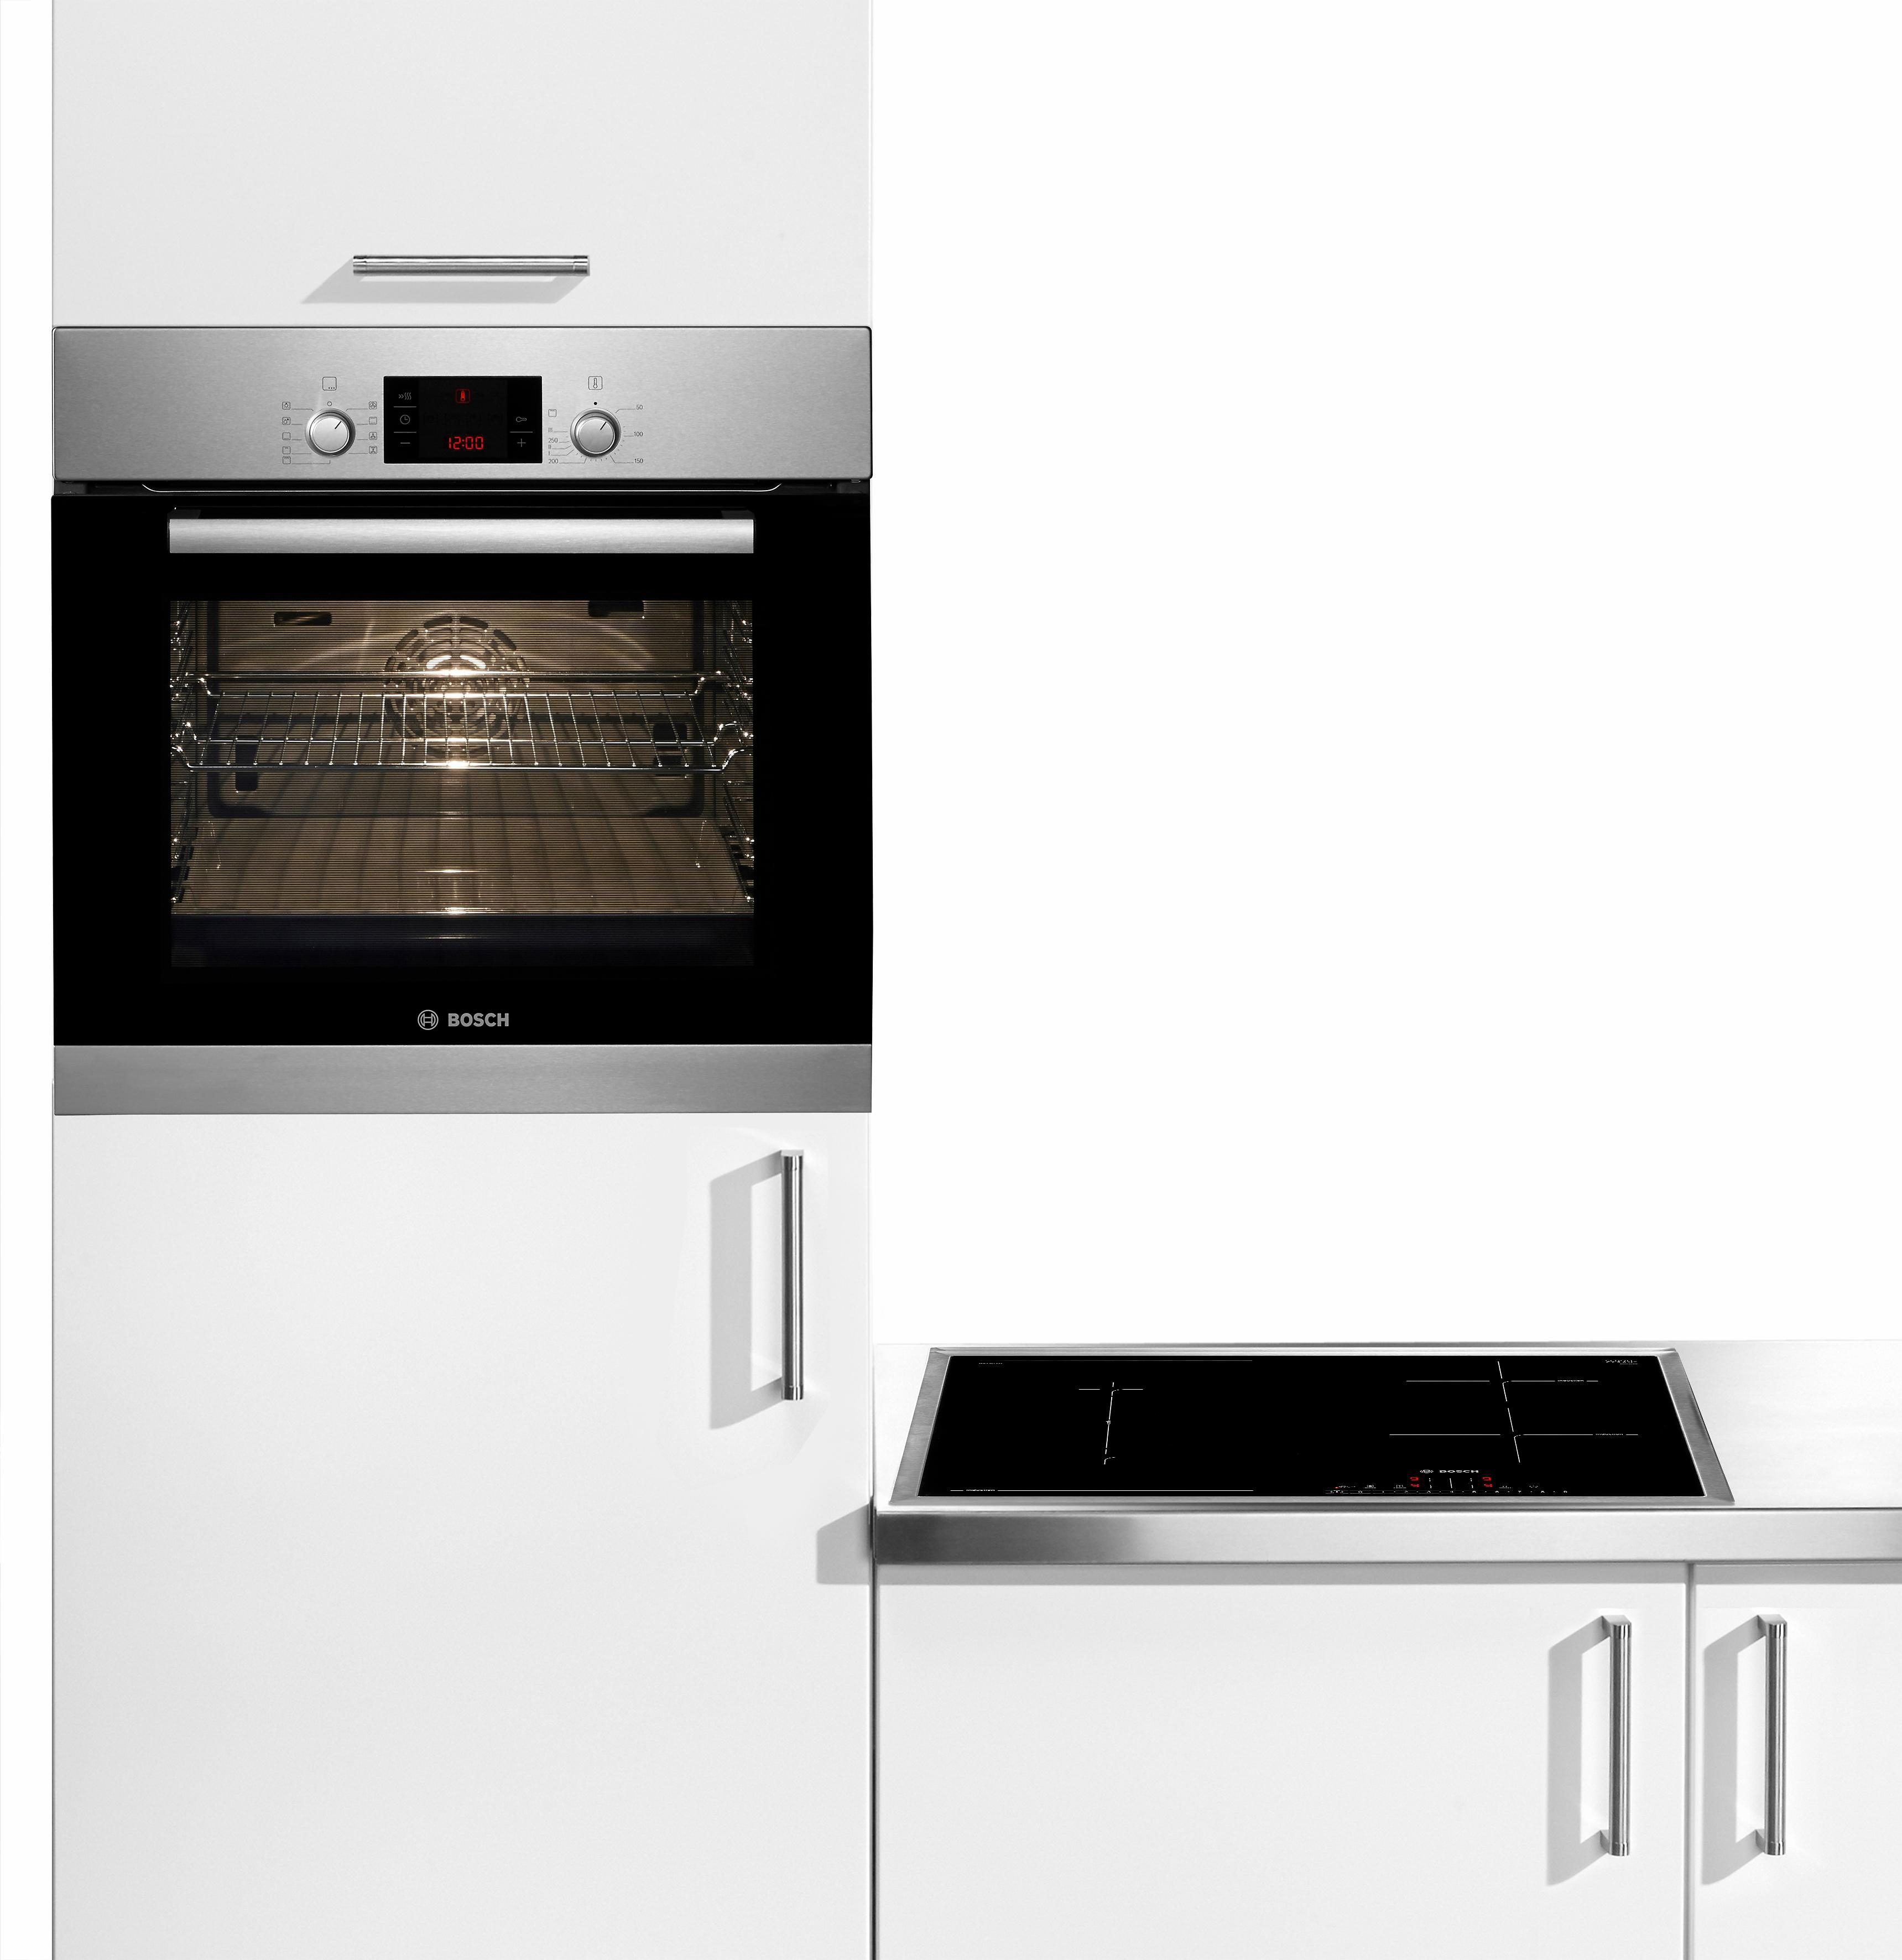 Bosch Induktions-Backofen-Set HBD30VR51, A